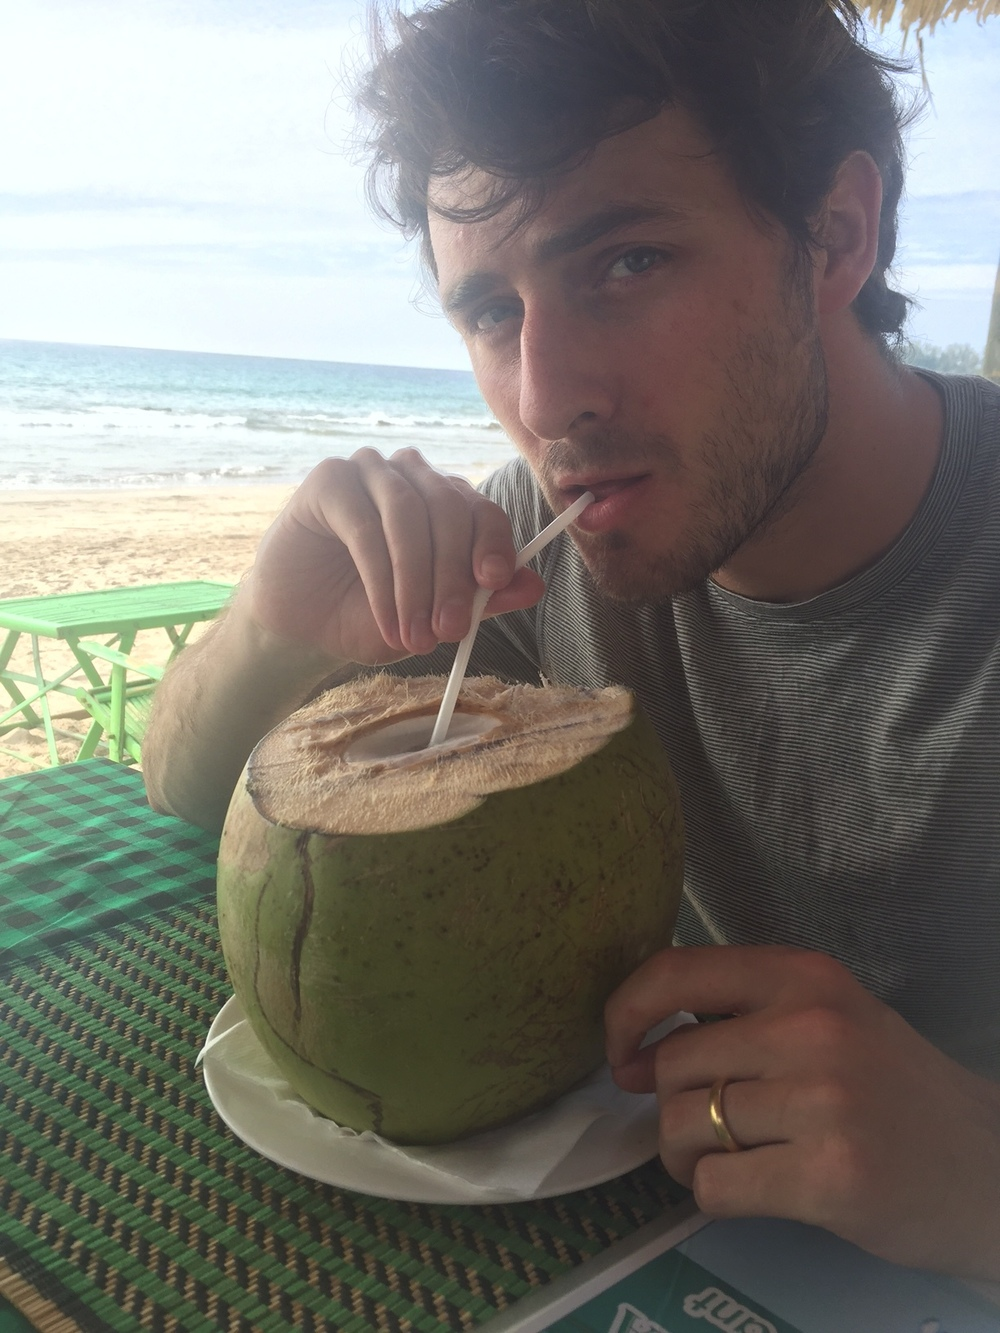 Coconut temptation